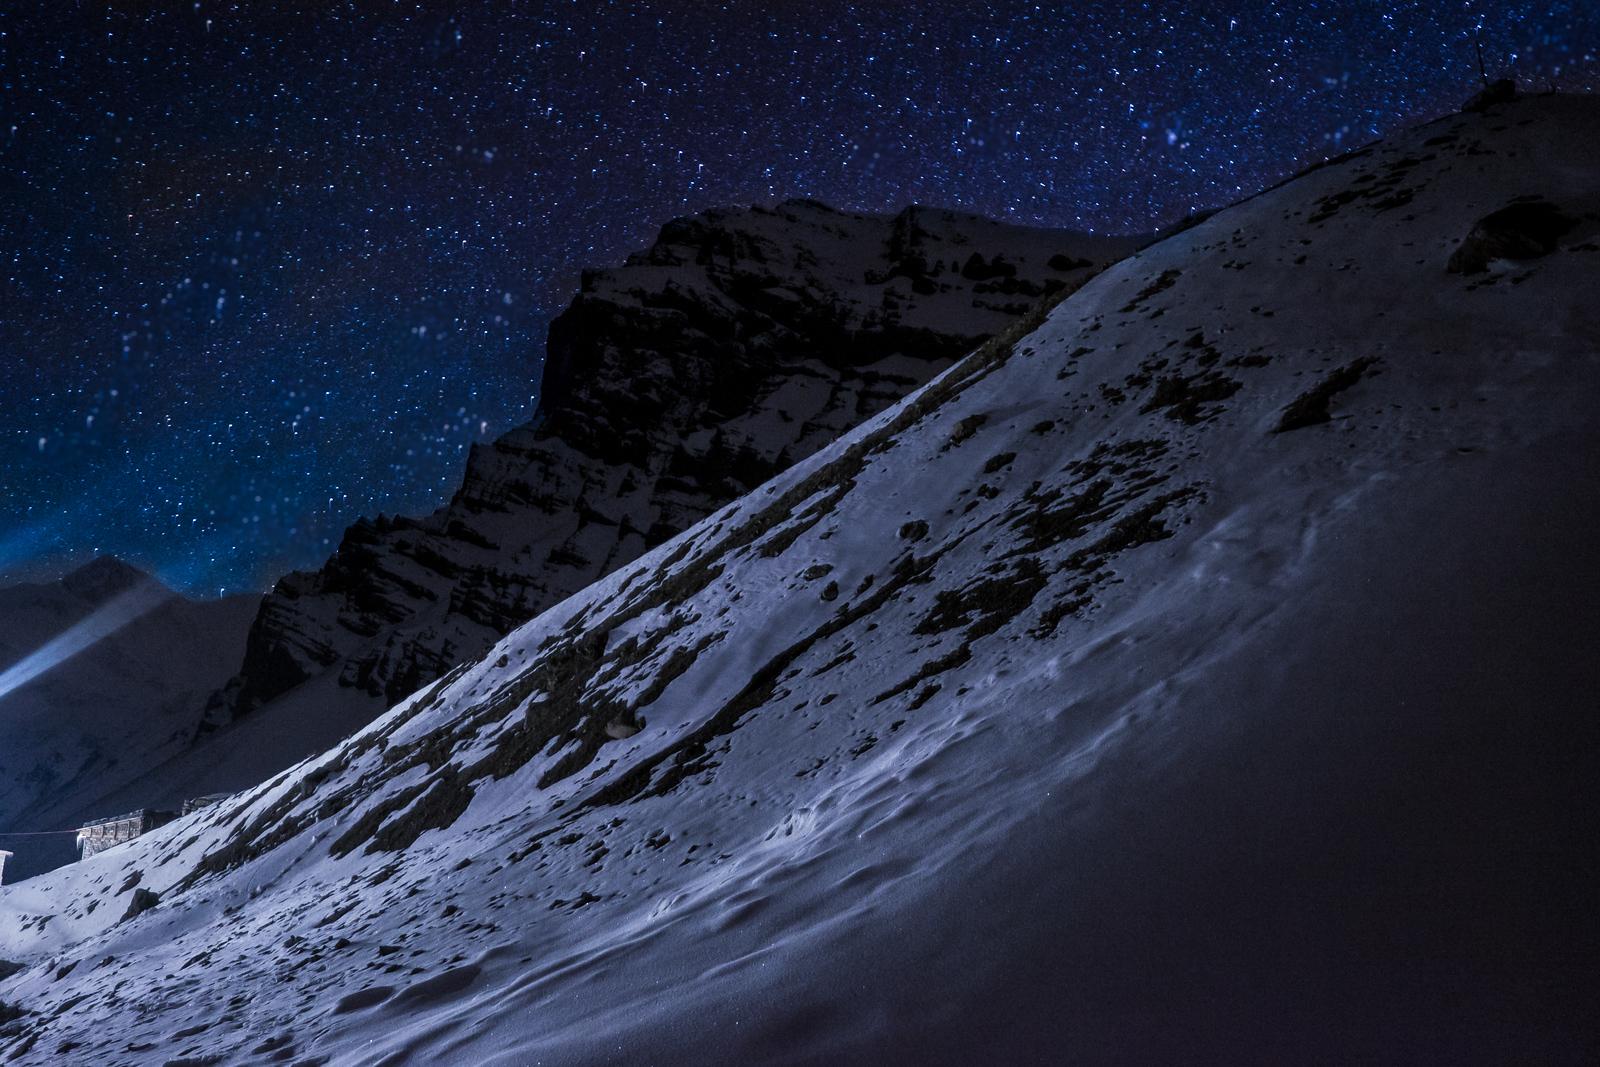 High Camp, 4800m, Annapurna Circuit, Nepal